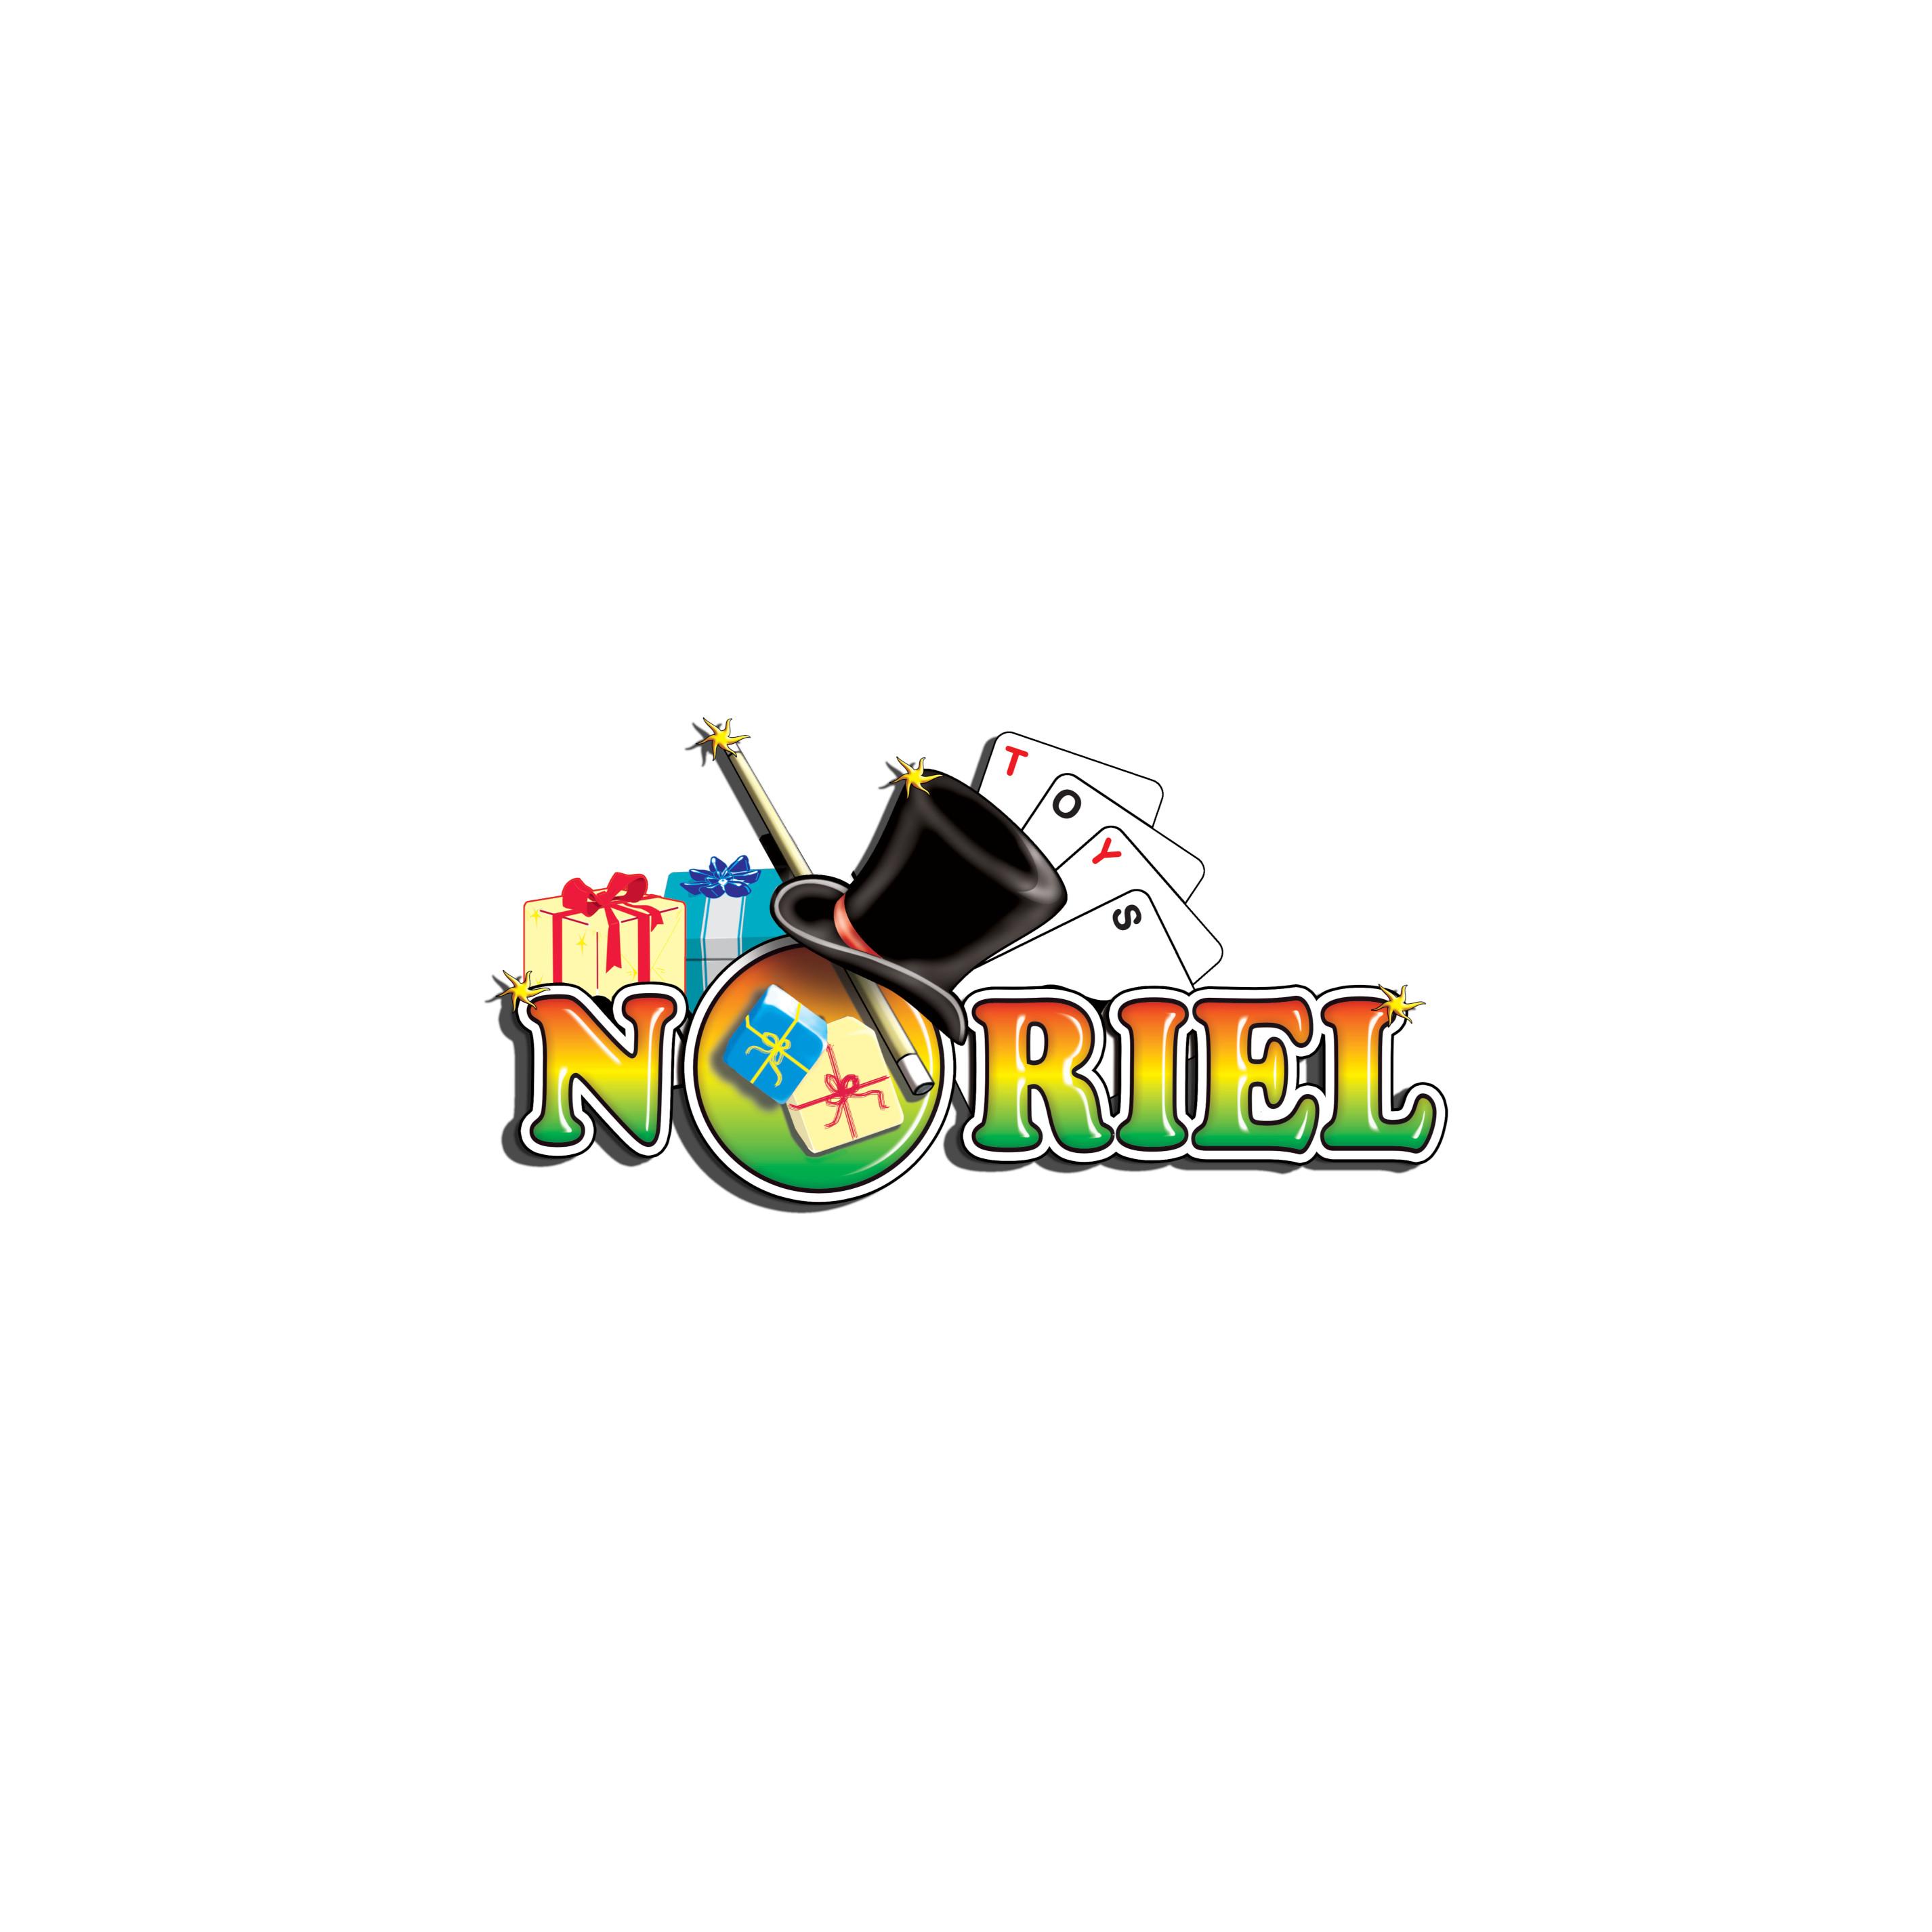 871125251104_001w Costum Mos Craciun pentru copii 6 - 9 ani Edco